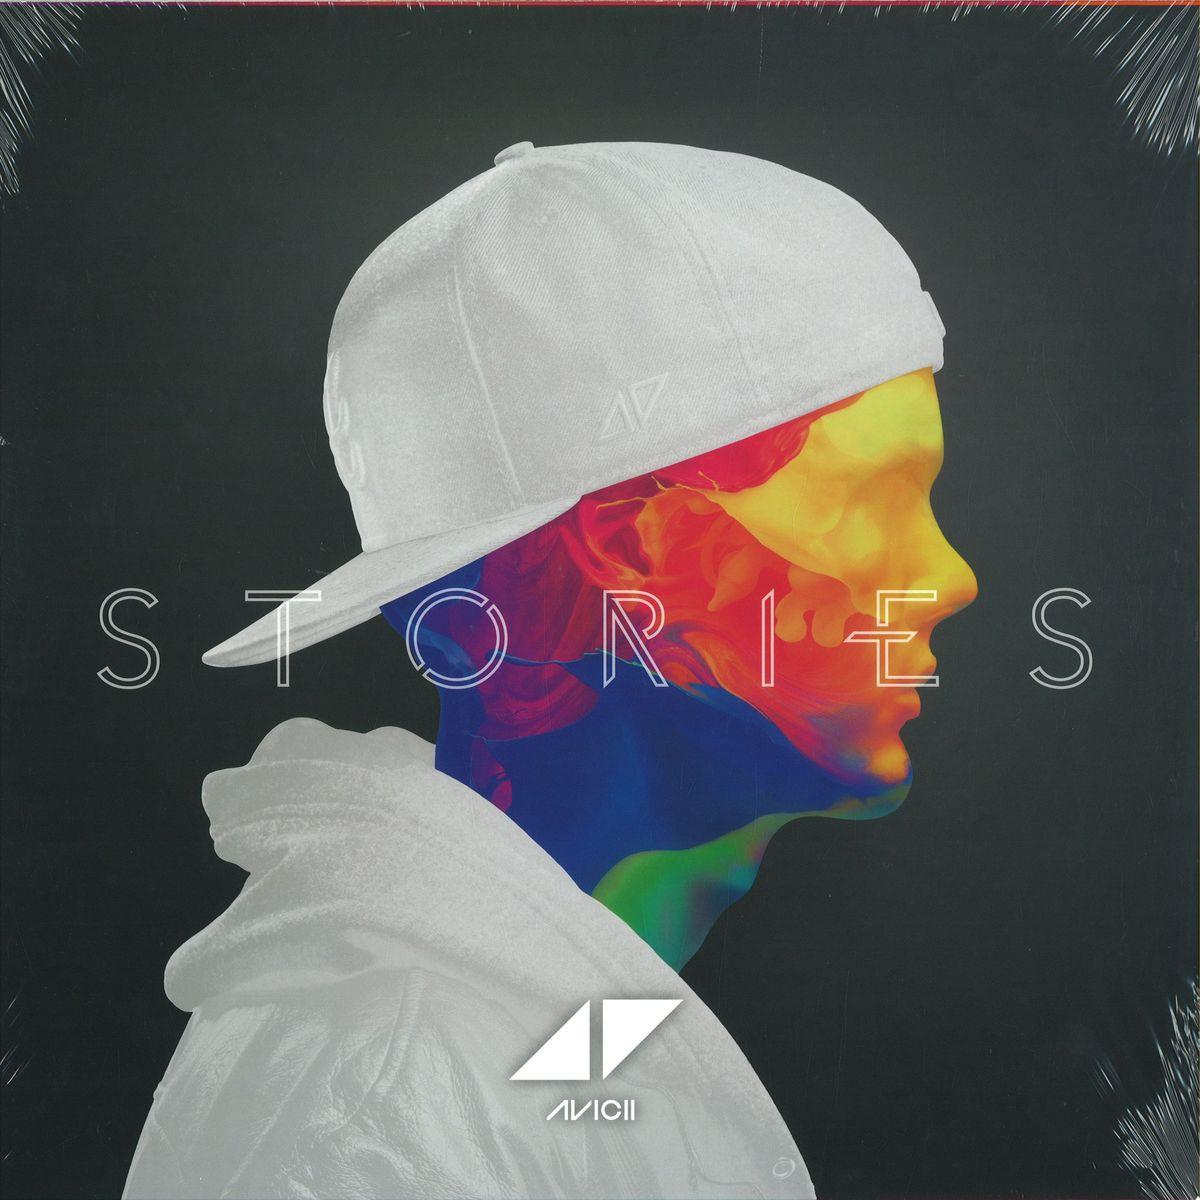 Avicii Stories Polydor 0602547484314 Vinyl